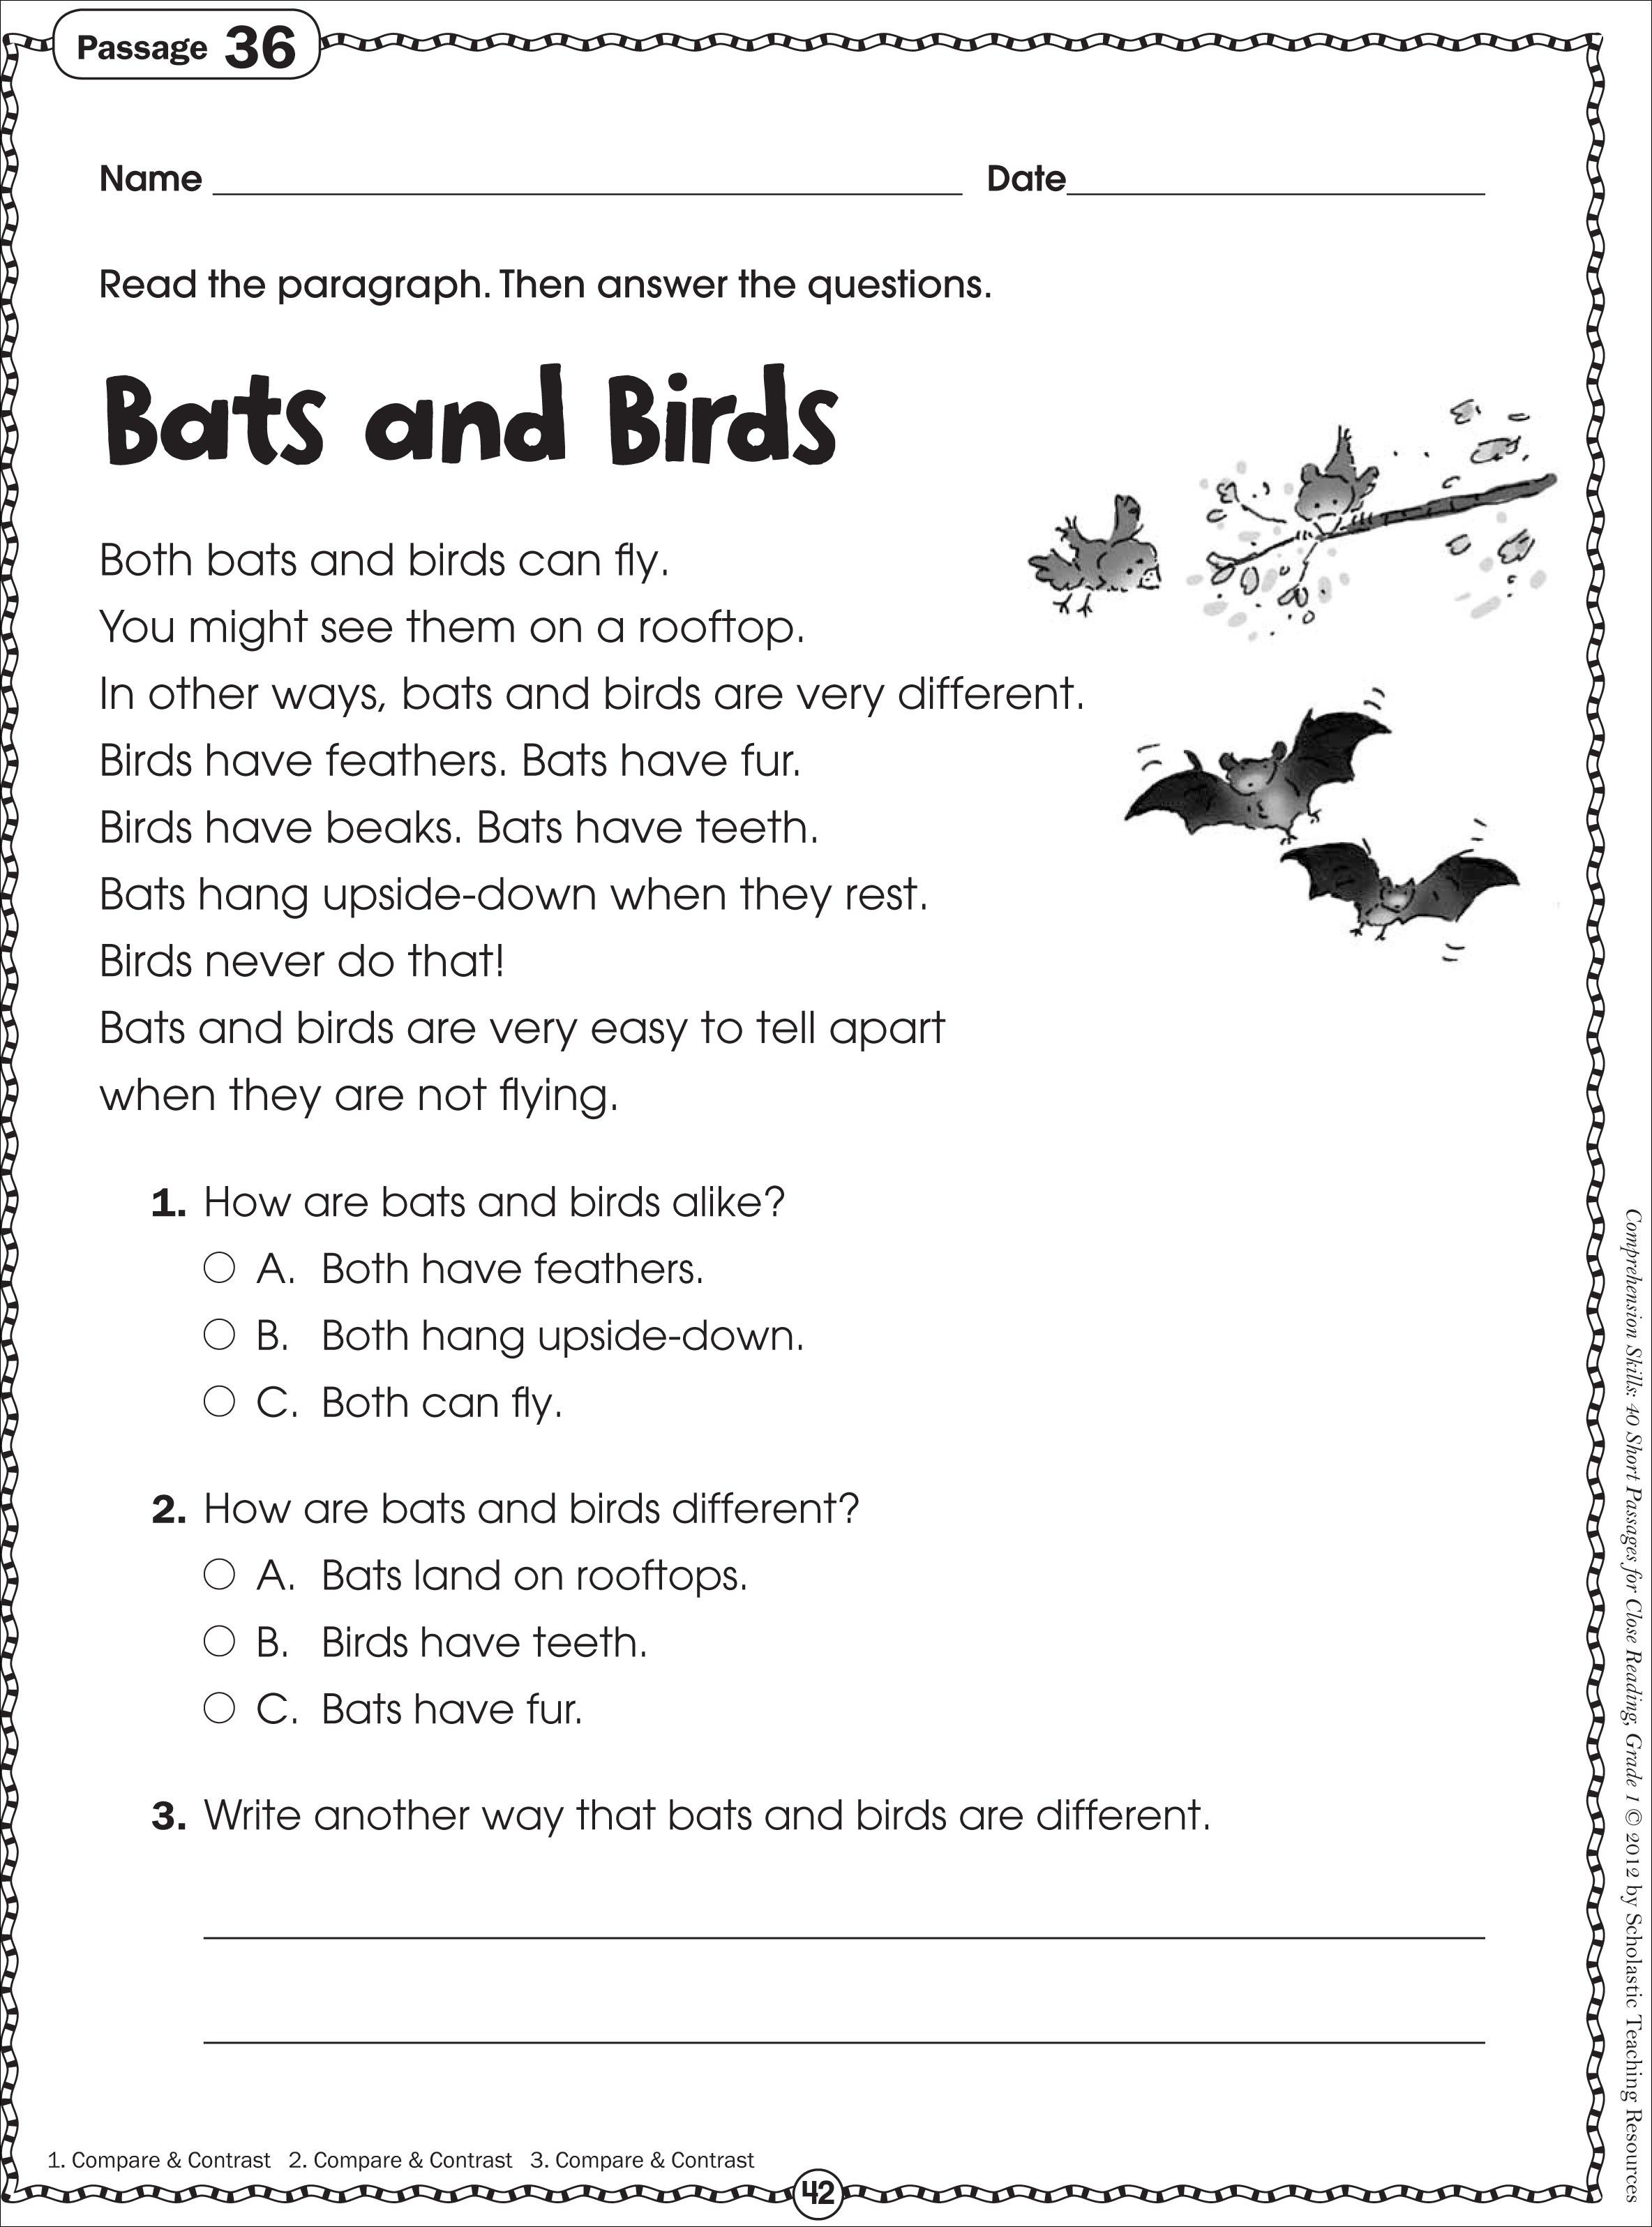 Free Printable Reading Comprehension Worksheets For Kindergarten | Year 3 Literacy Worksheets Printable